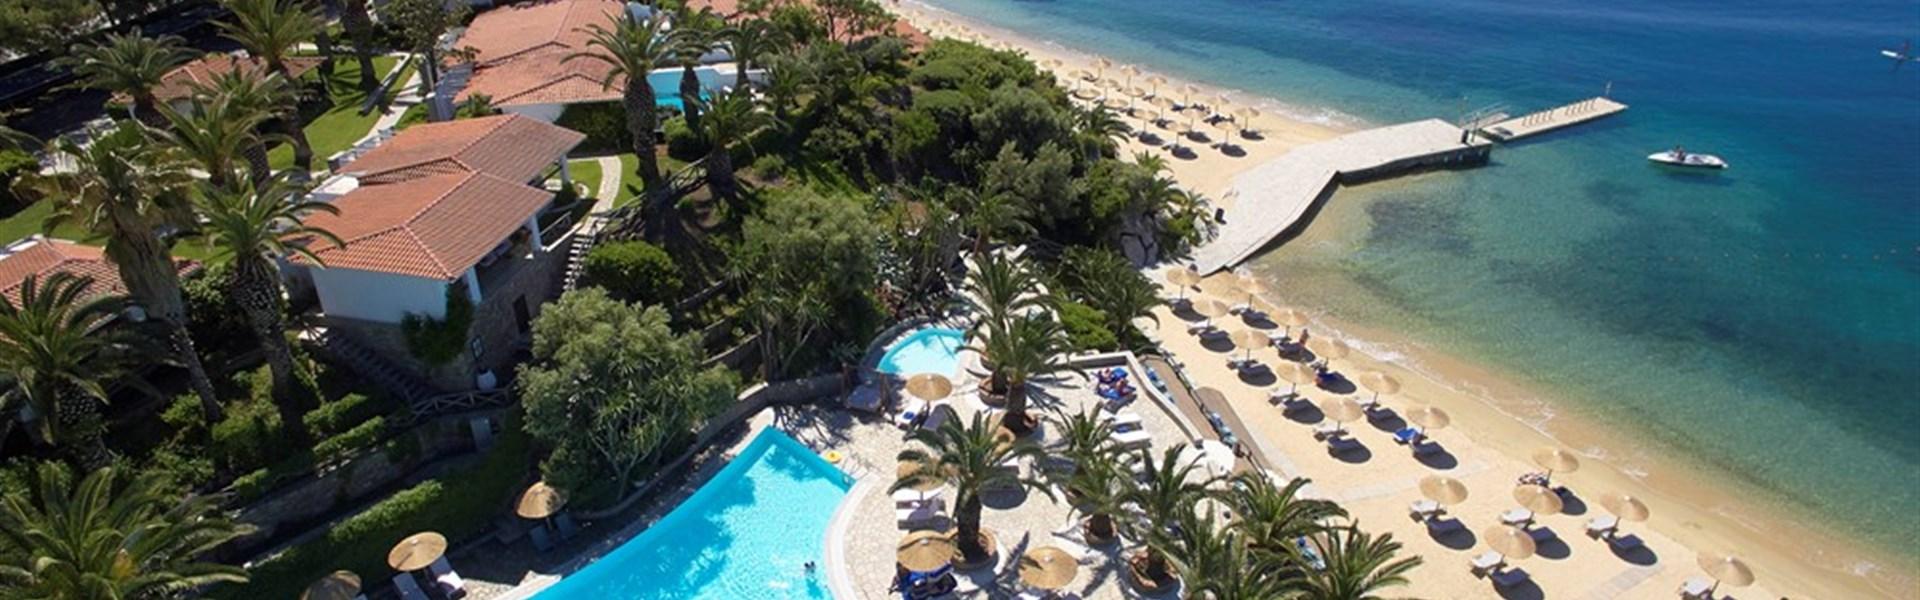 Marco Polo - Eagles Palace Resort 5* - bazén a pláž hotelu Eagles palace